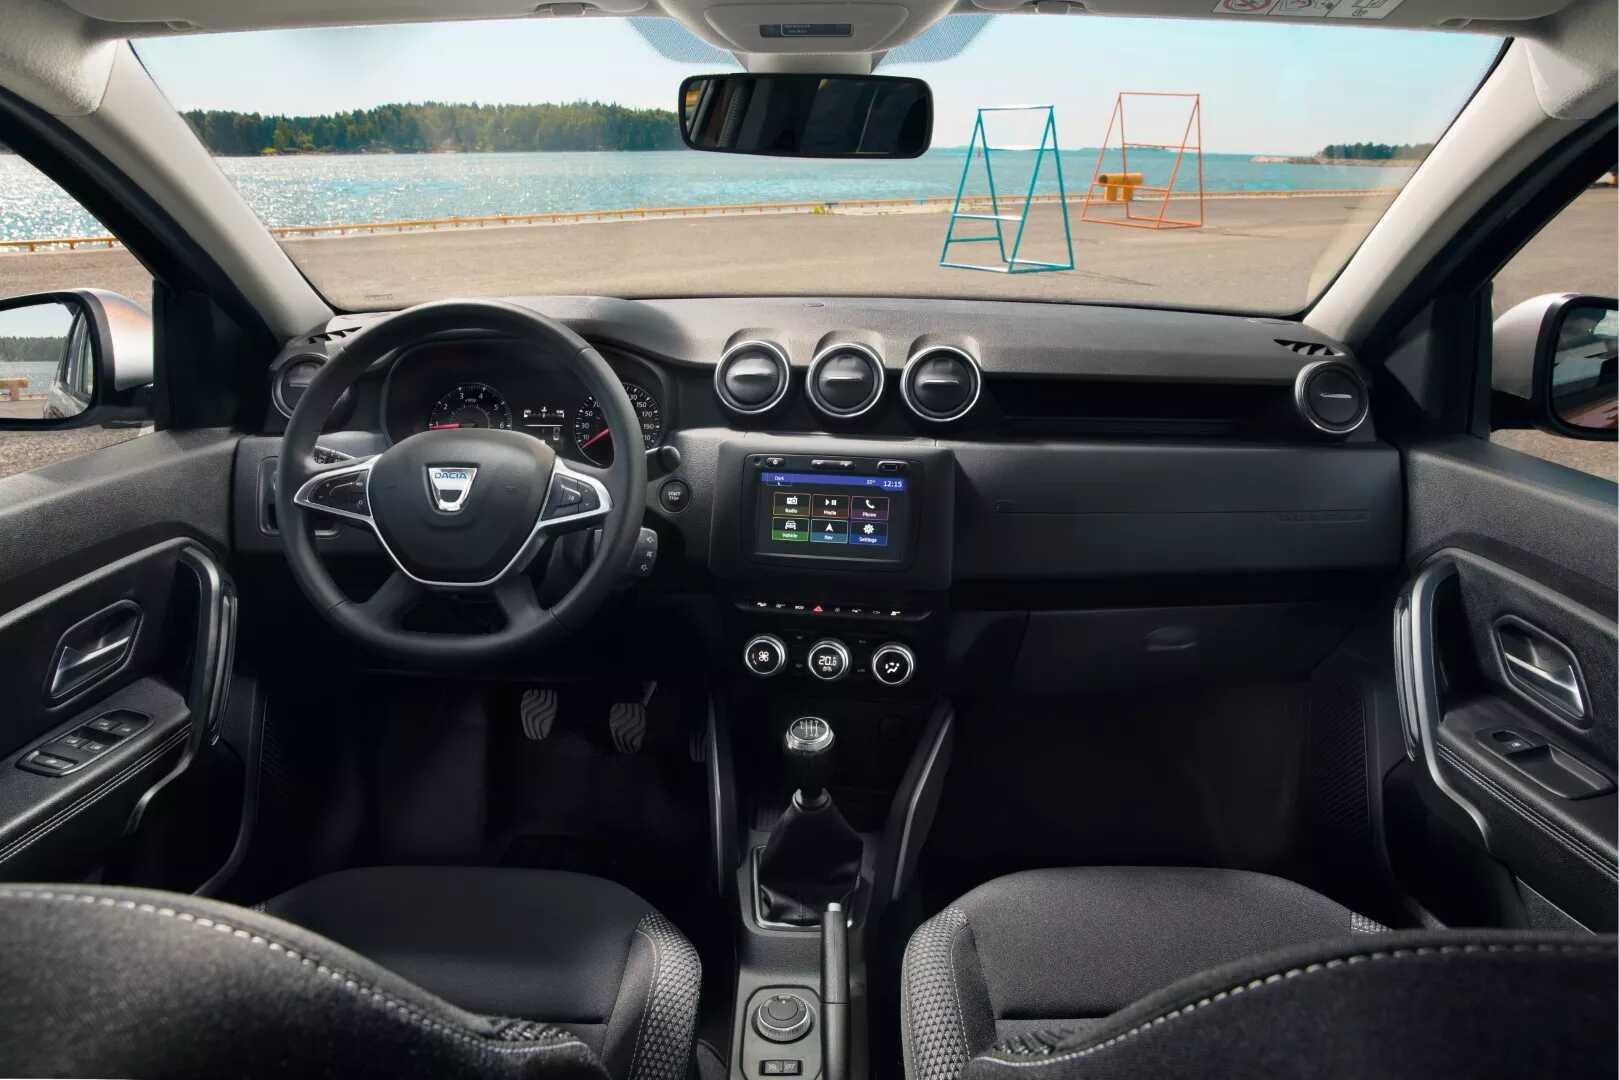 Ecran tactile pour autoradio Android Duster